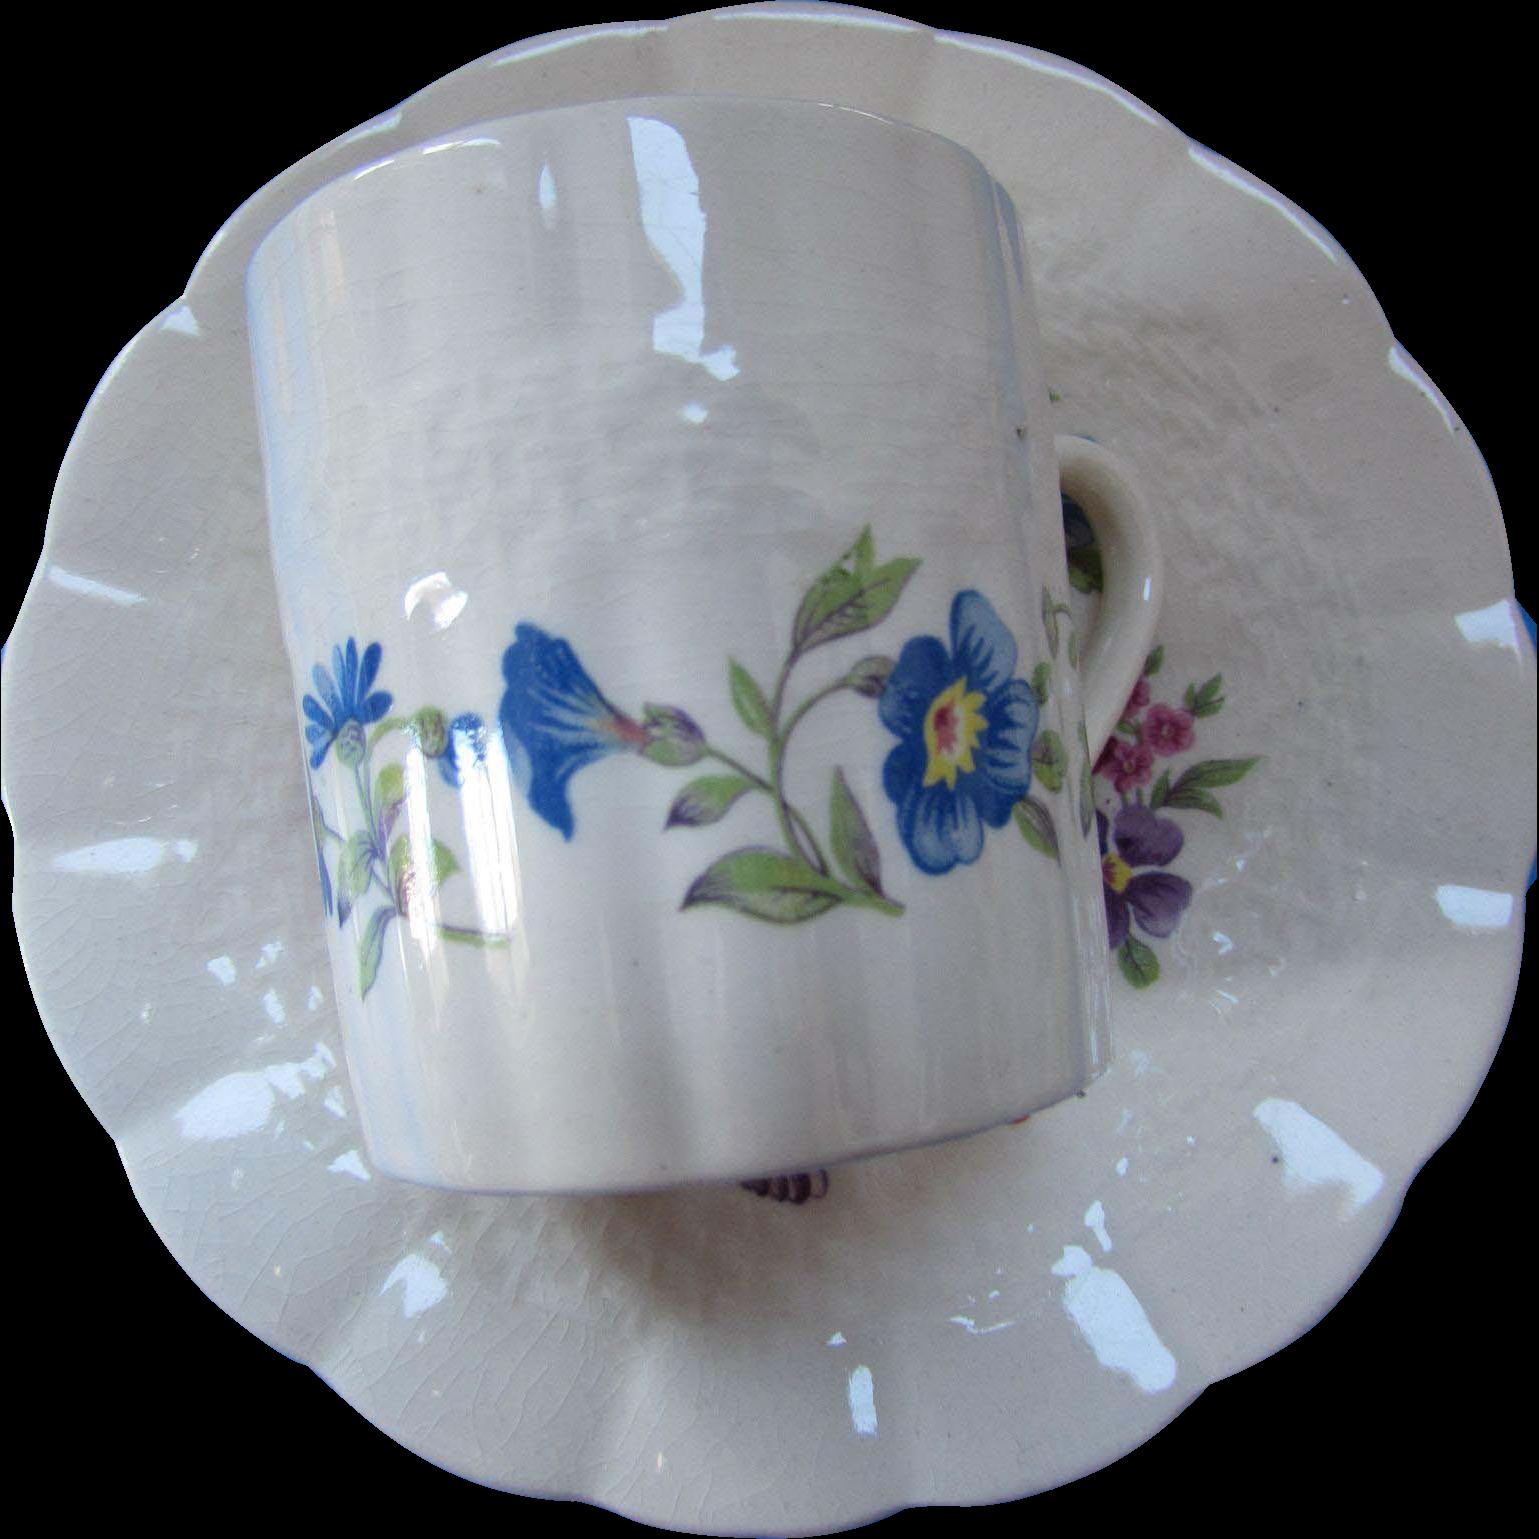 Flower Ring Demitasse Cup Saucer 6 Piece Set SOHO Potteries Ambassador Ware England Reedwoods Pattern